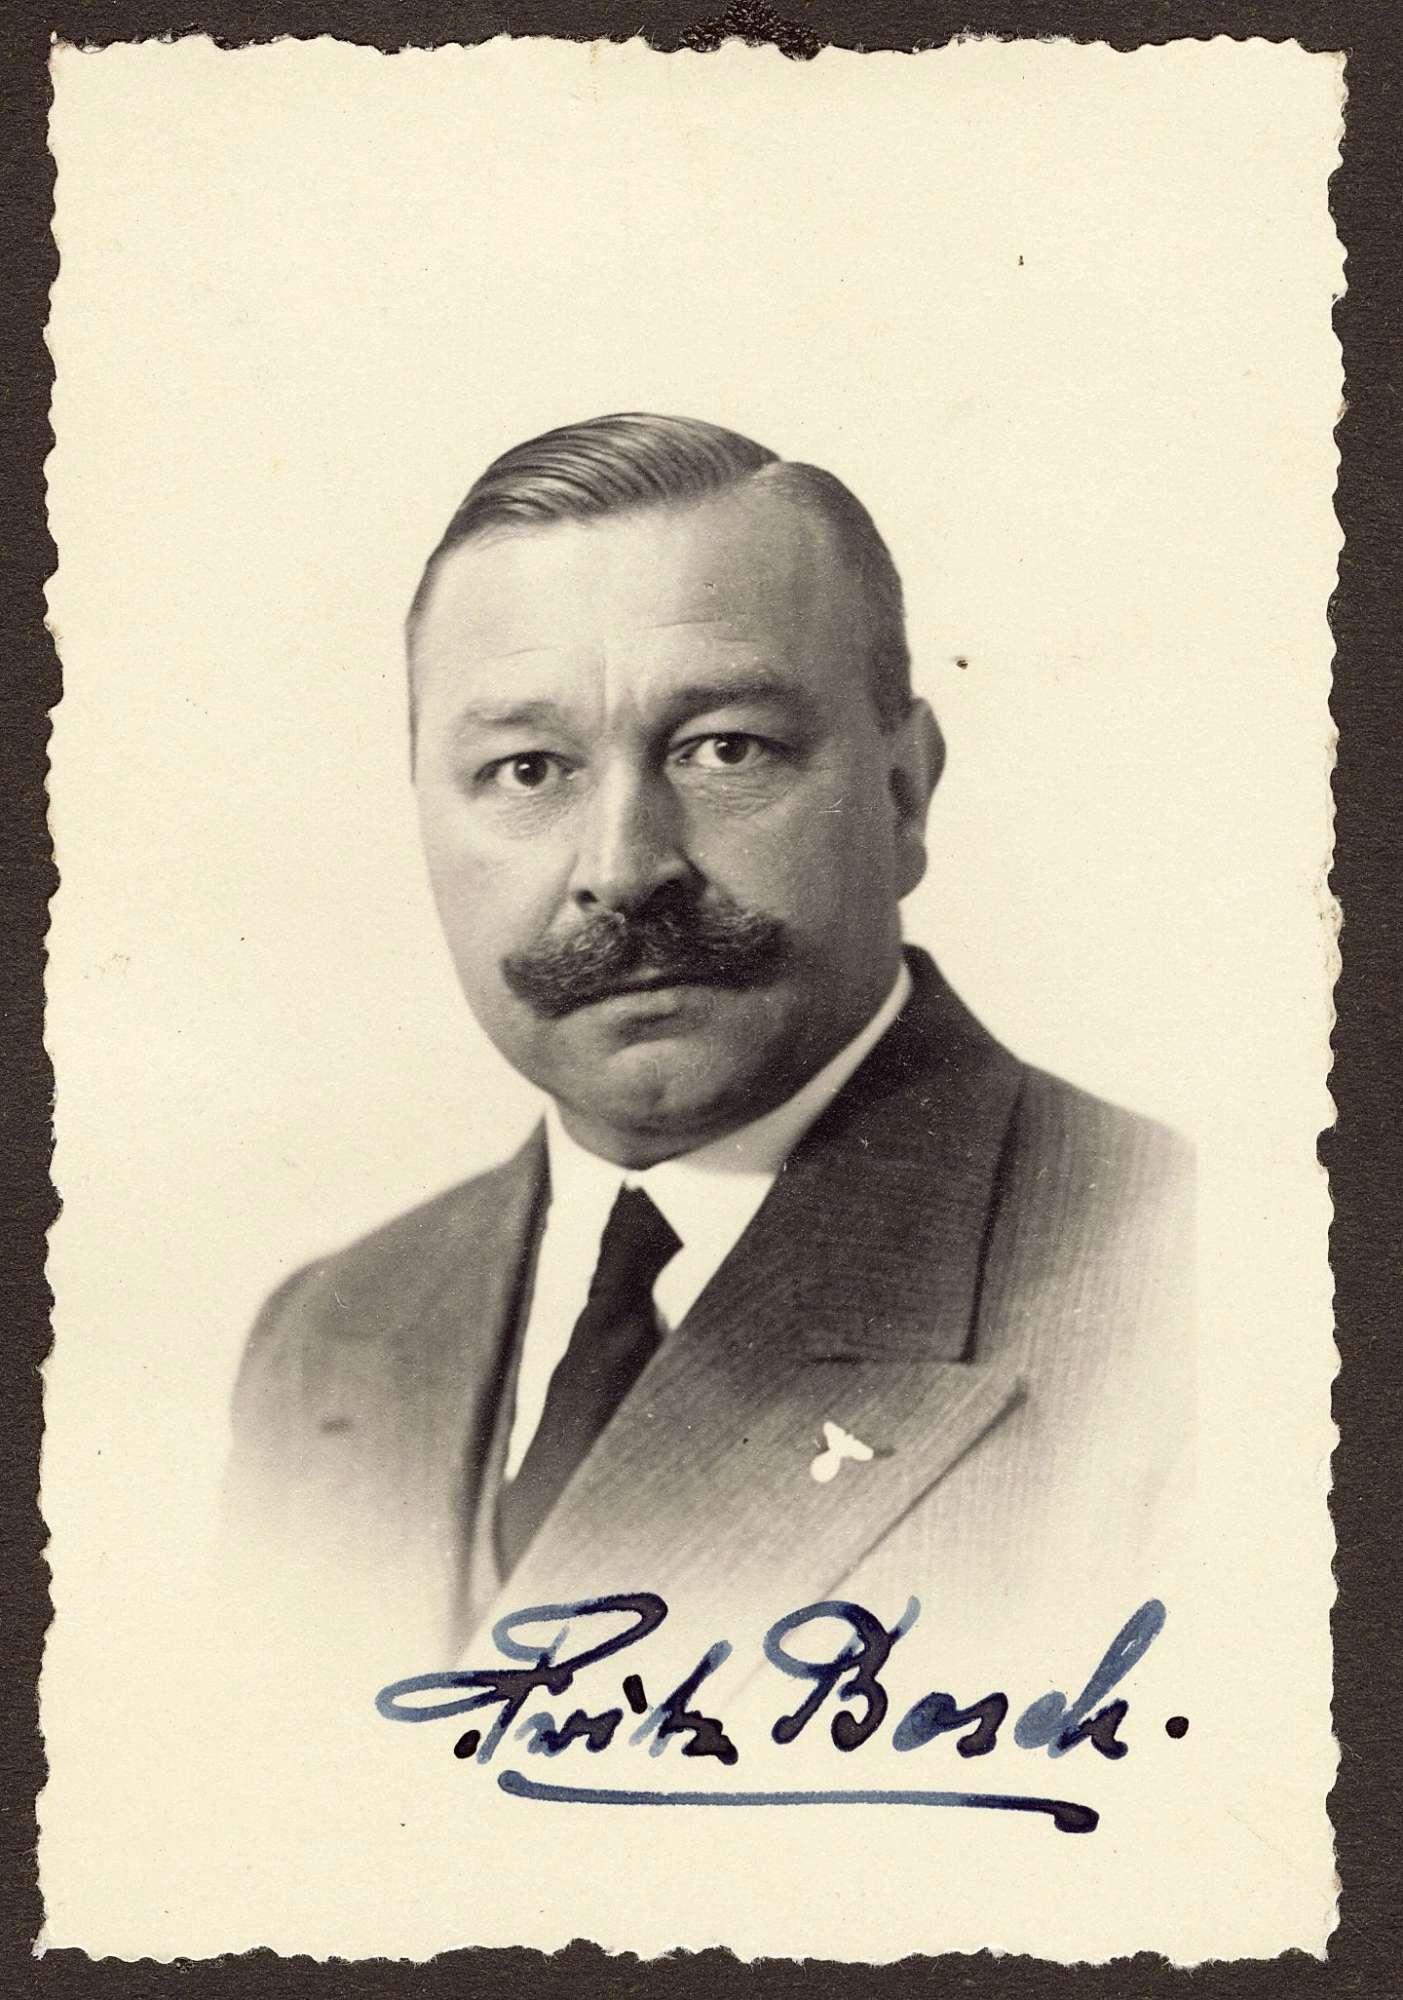 Bosch, Fritz, Bild 1